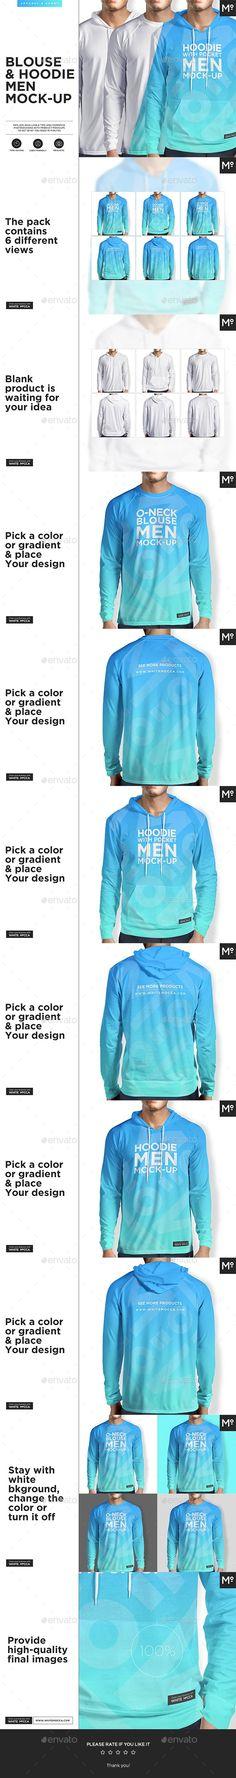 28 T Shirt Mock Up Ideas Tshirt Mockup T Shirt Shirt Mockup